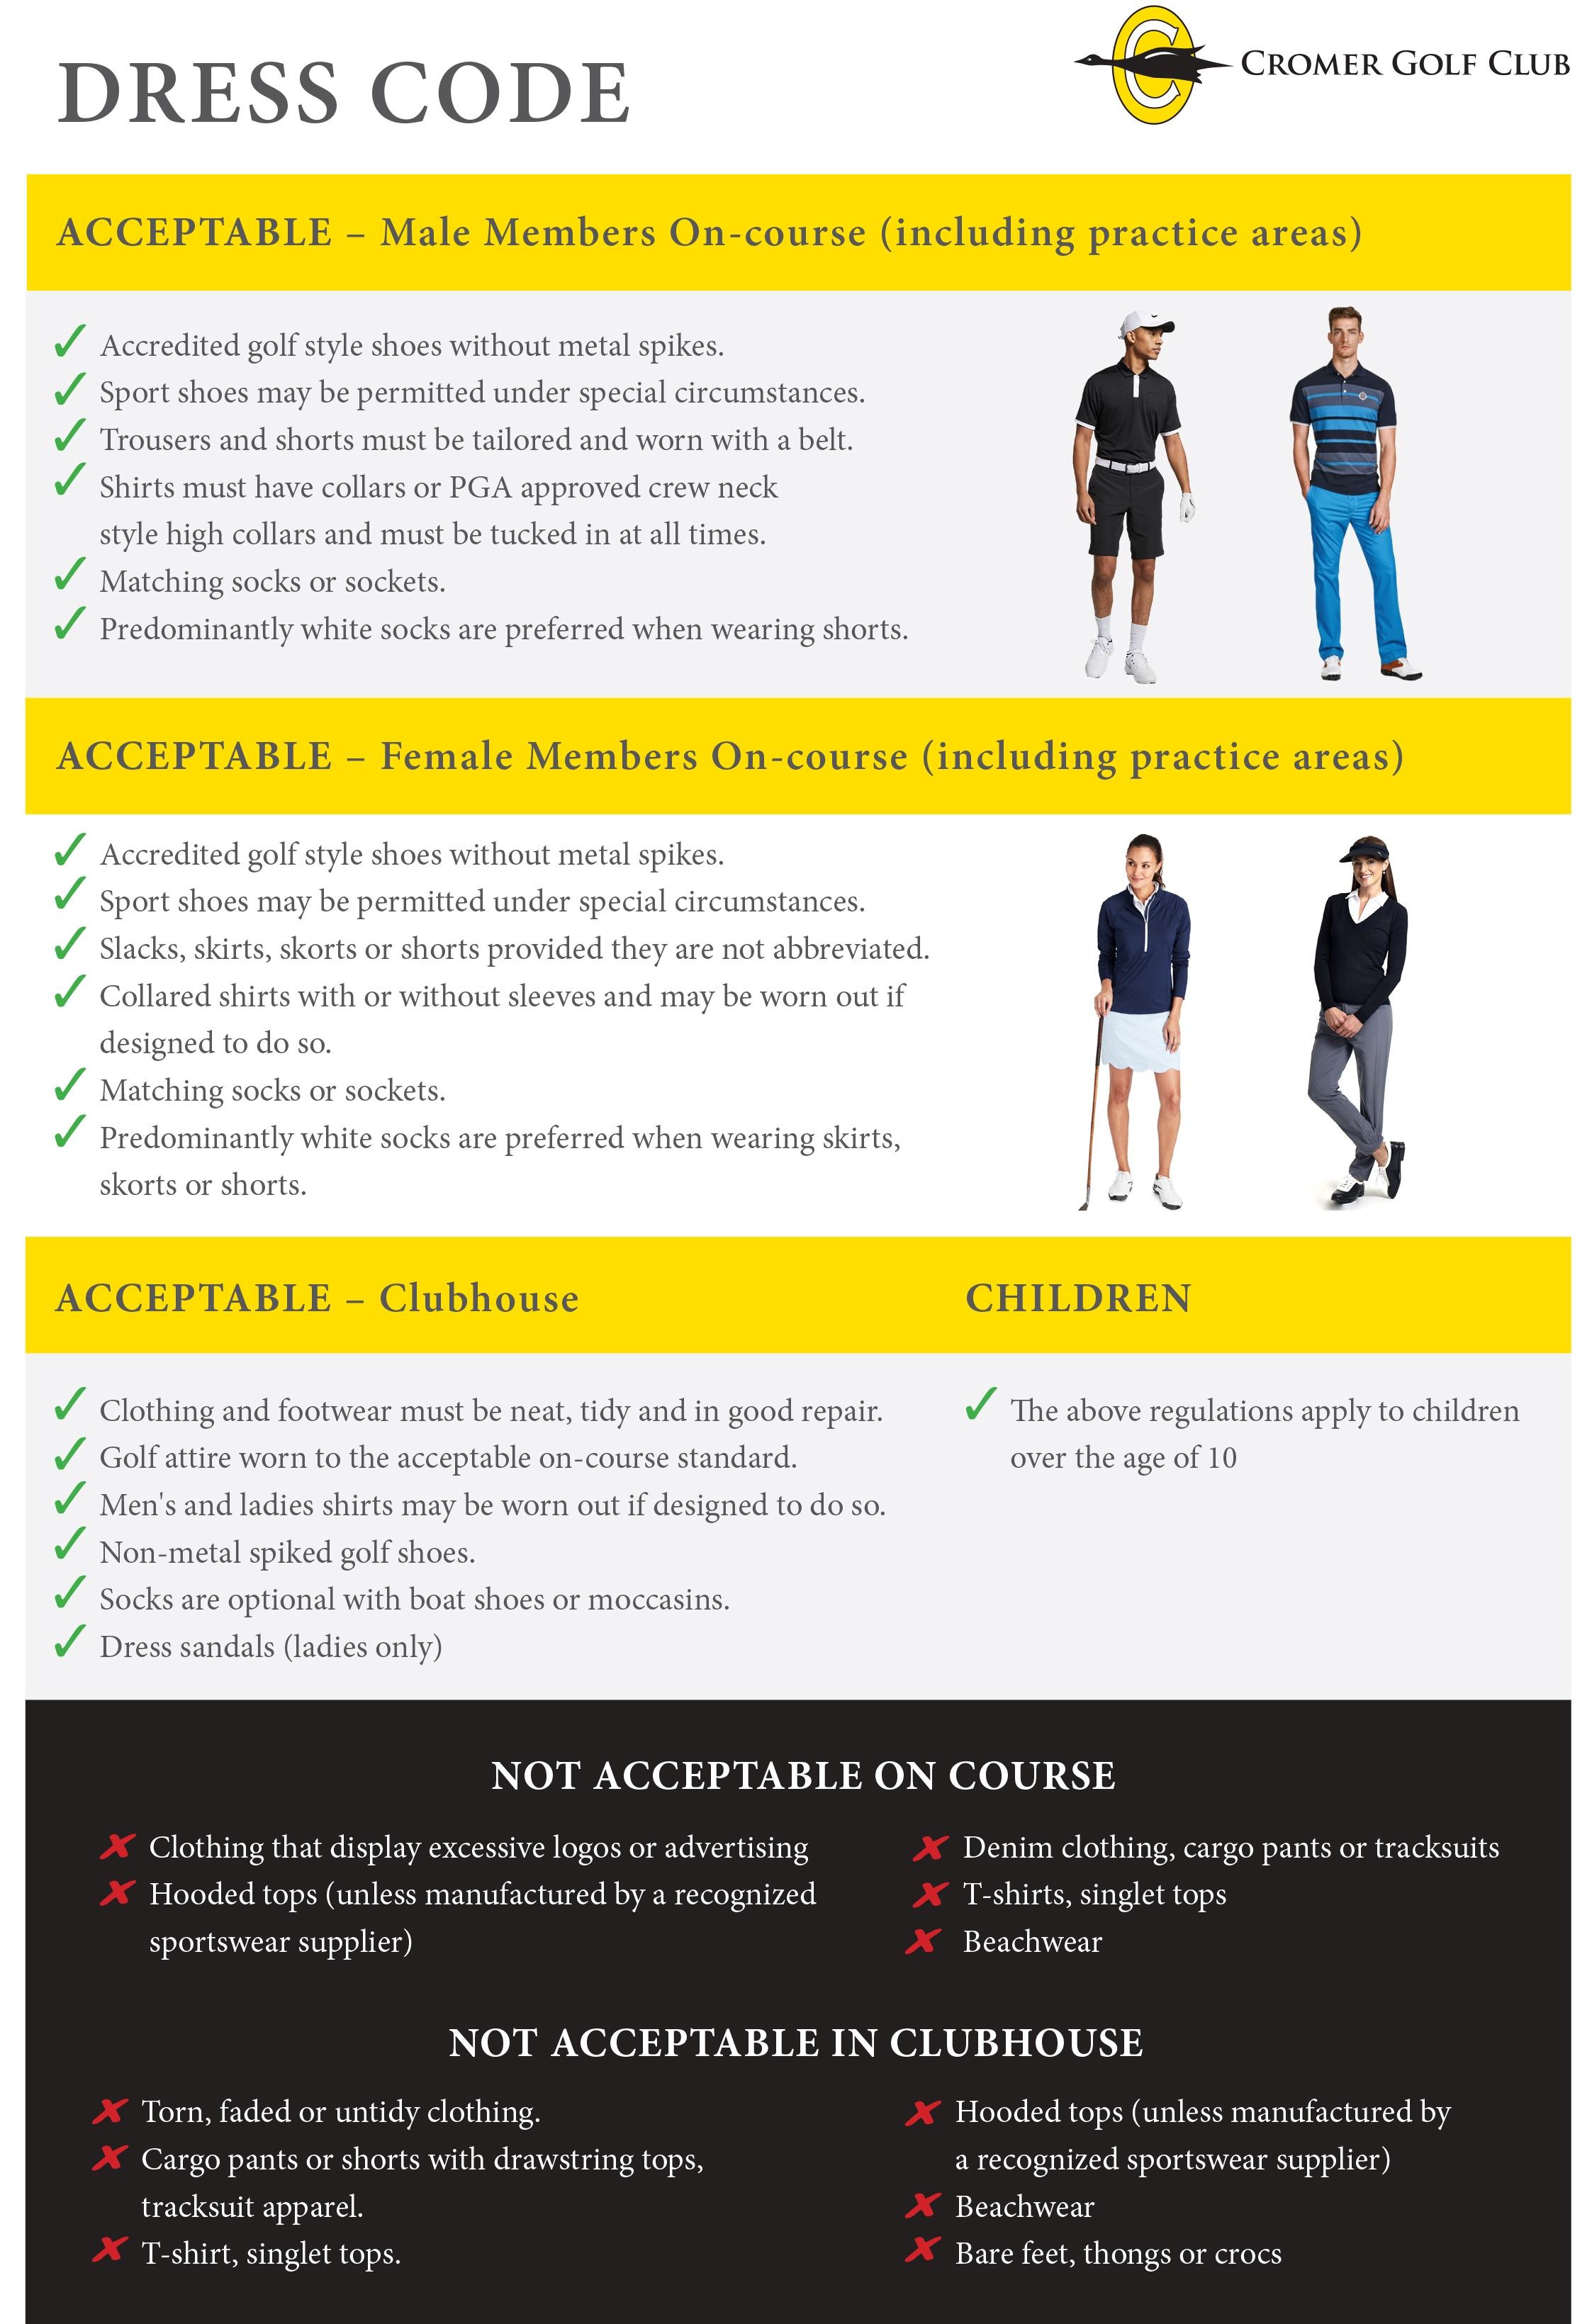 Dress Code Image